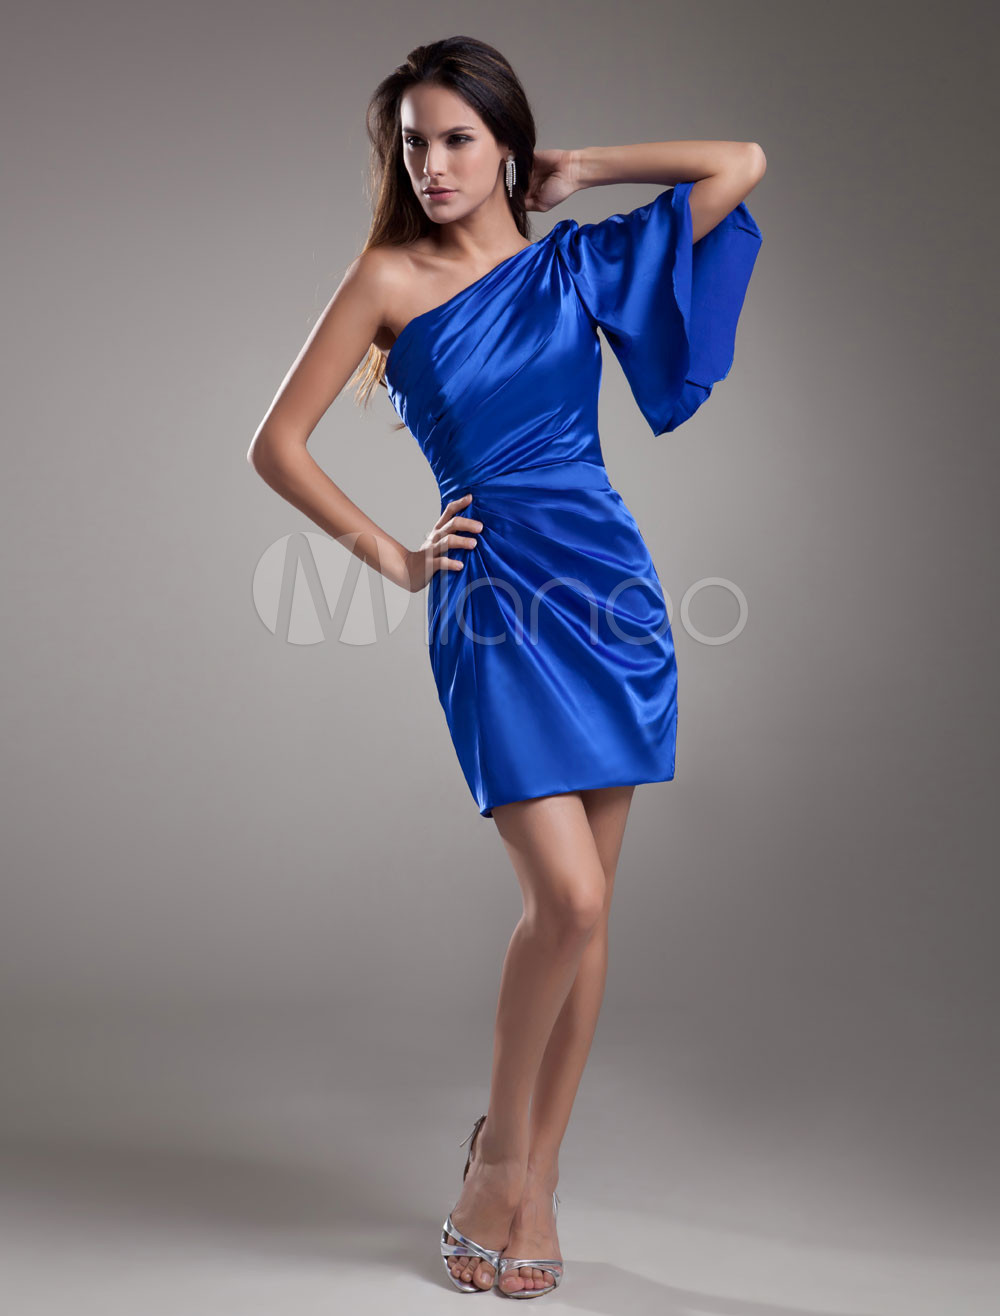 Sexy Sheath Royal Blue Elastic Woven Satin Tiered One-Shoulder Short Fashion Bridesmaid Dress